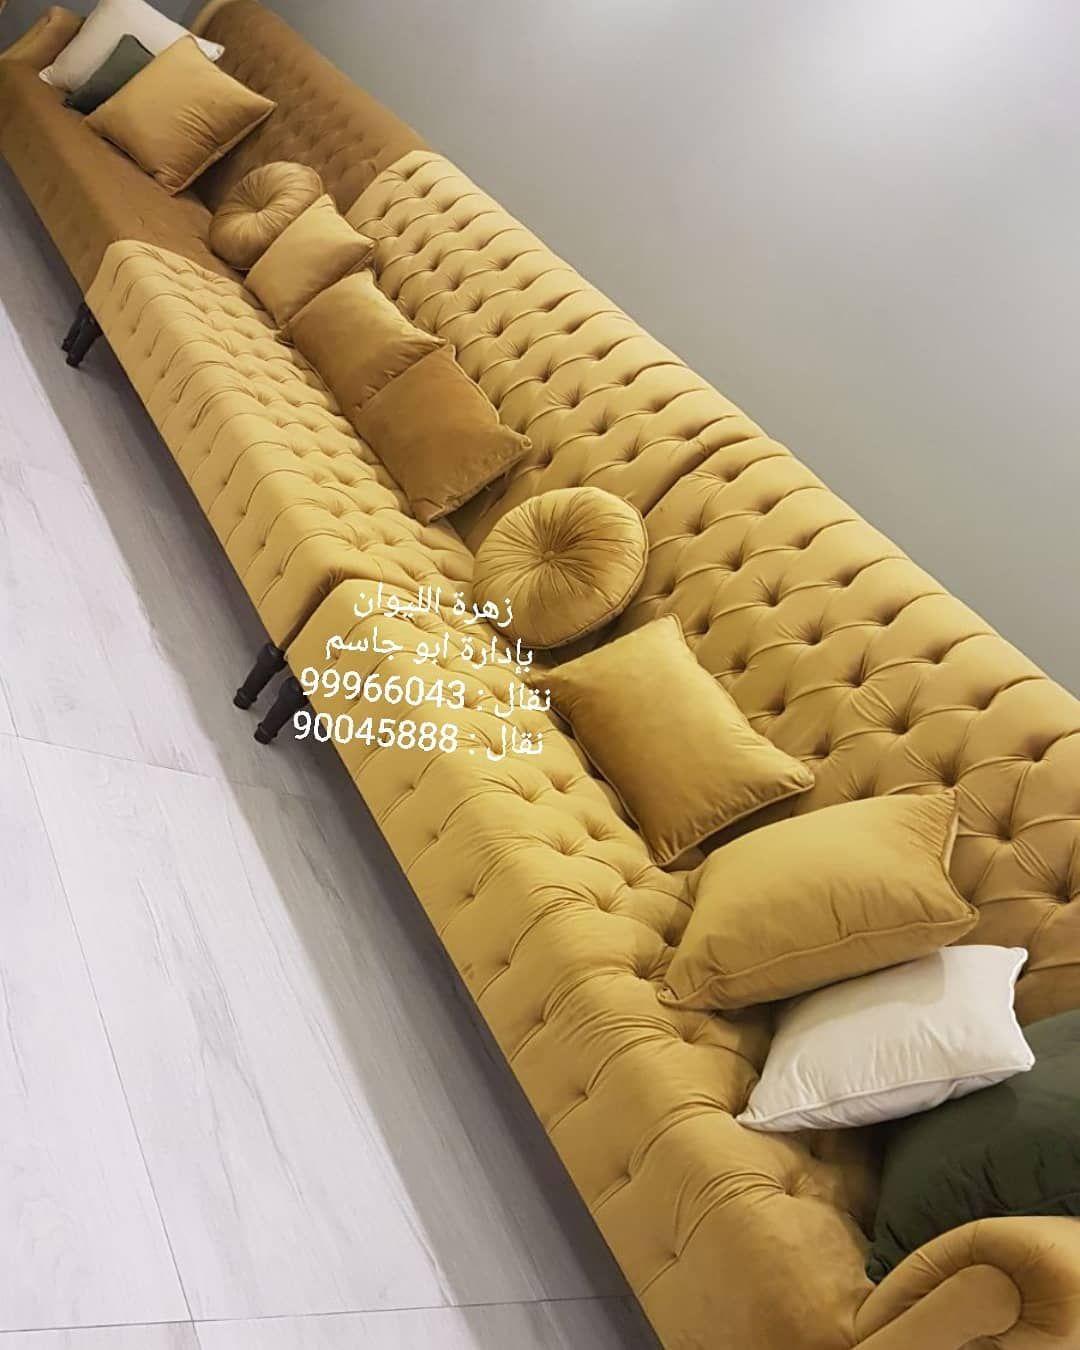 Pin By Saf Mohm On اثاث كنب Furniture Decor Room Decor